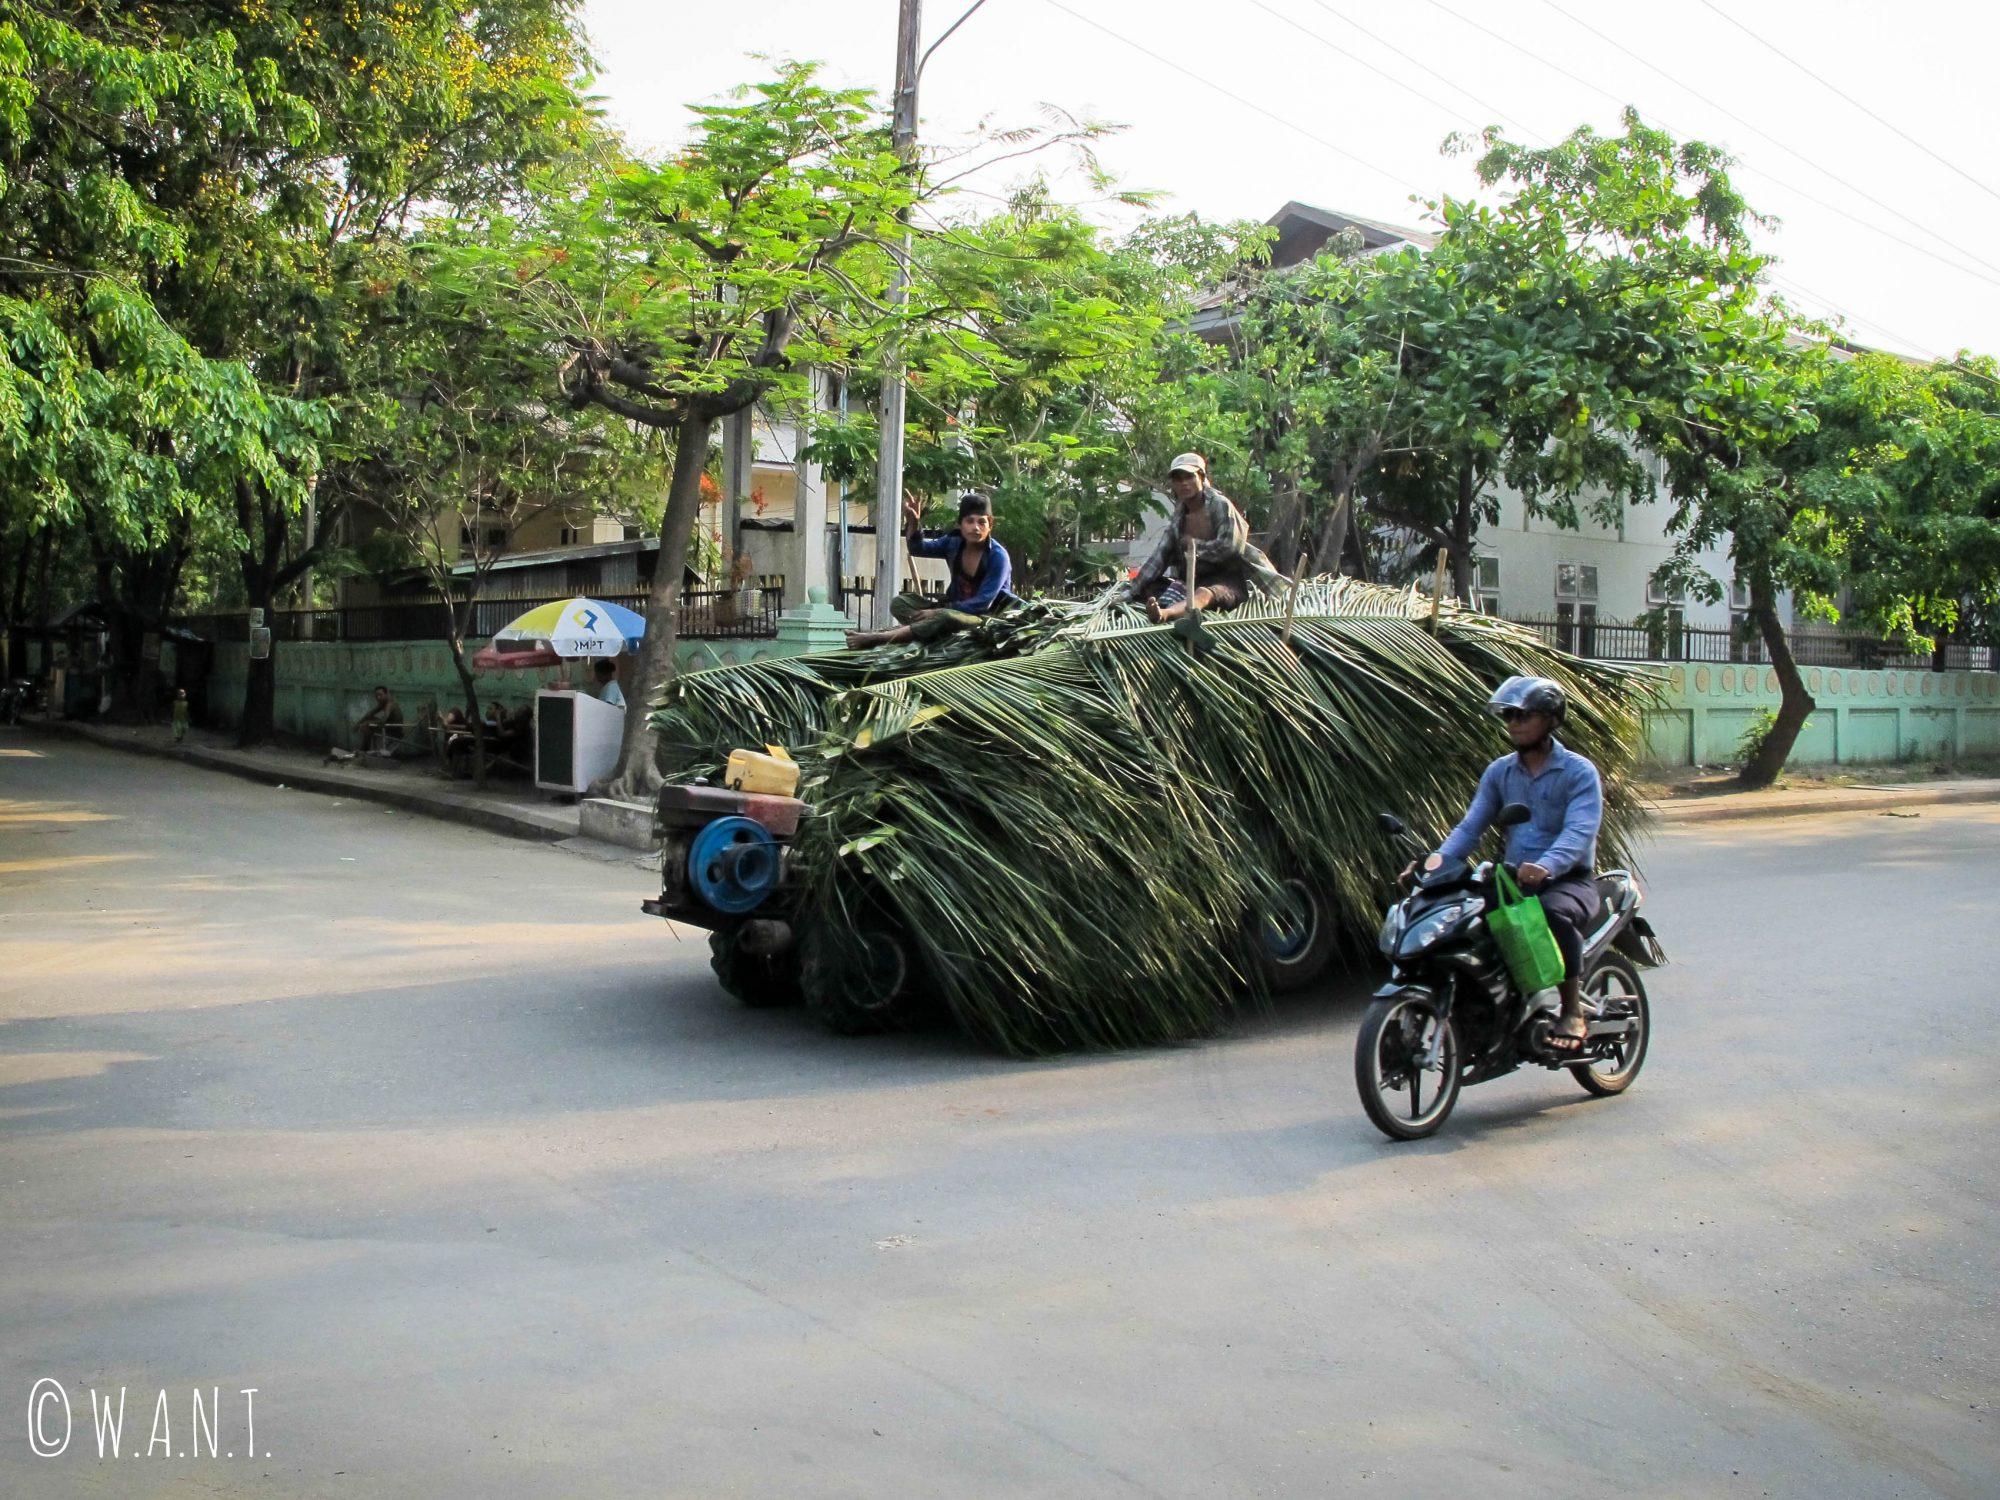 Chargement de feuilles de palme dans les rues de Mandalay